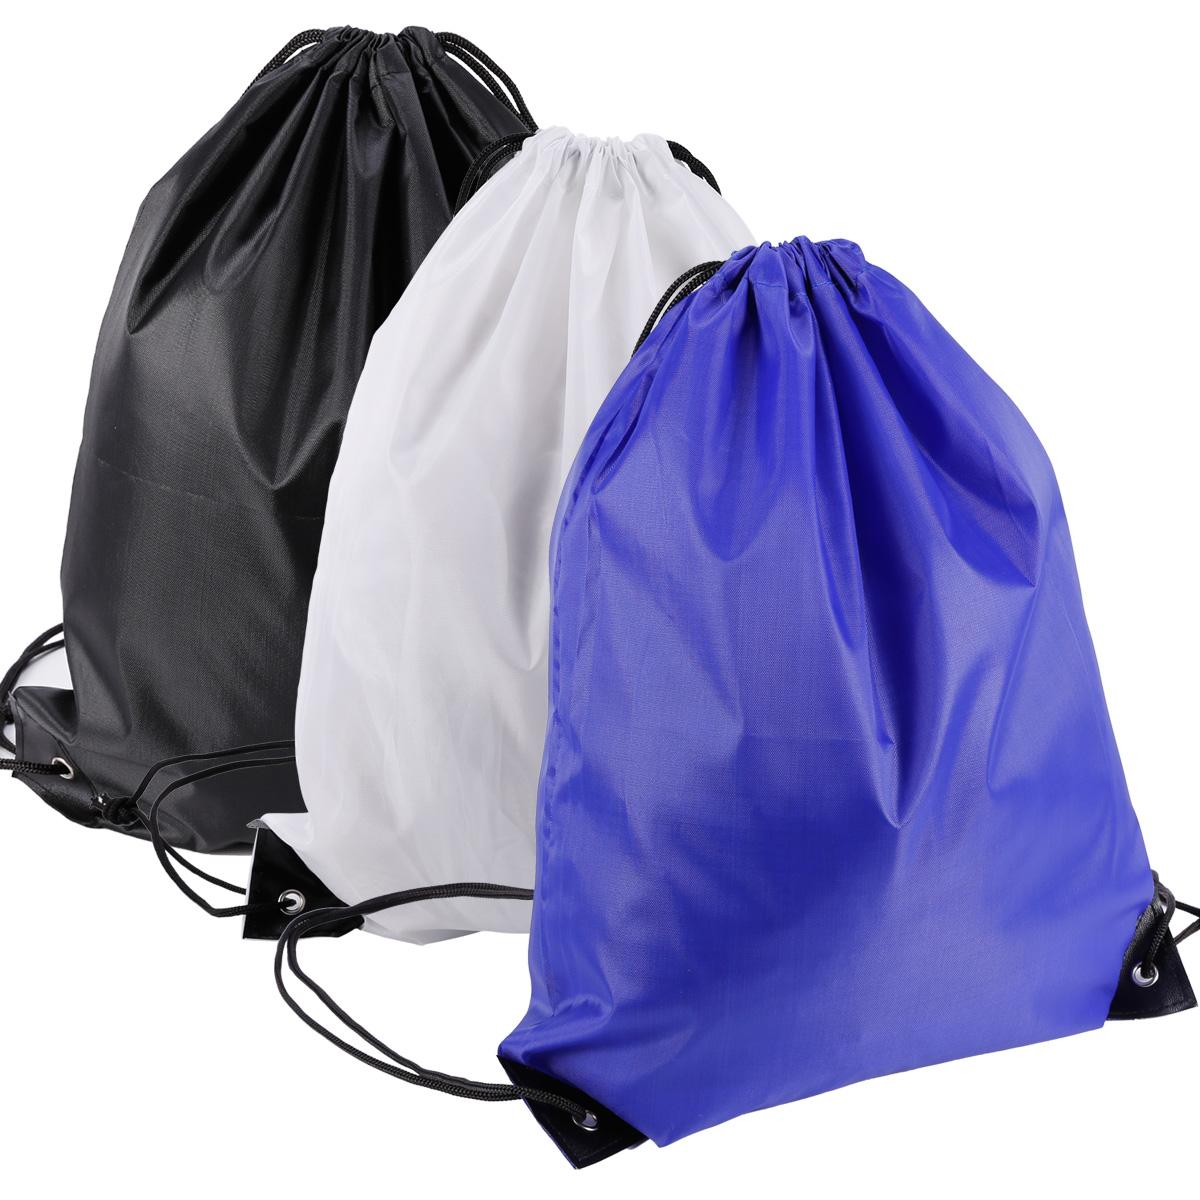 Cinch Sack Canvas Storage School Gym Drawstring Bag Pack Rucksack Backpack Pouch Men's Bags Backpacks